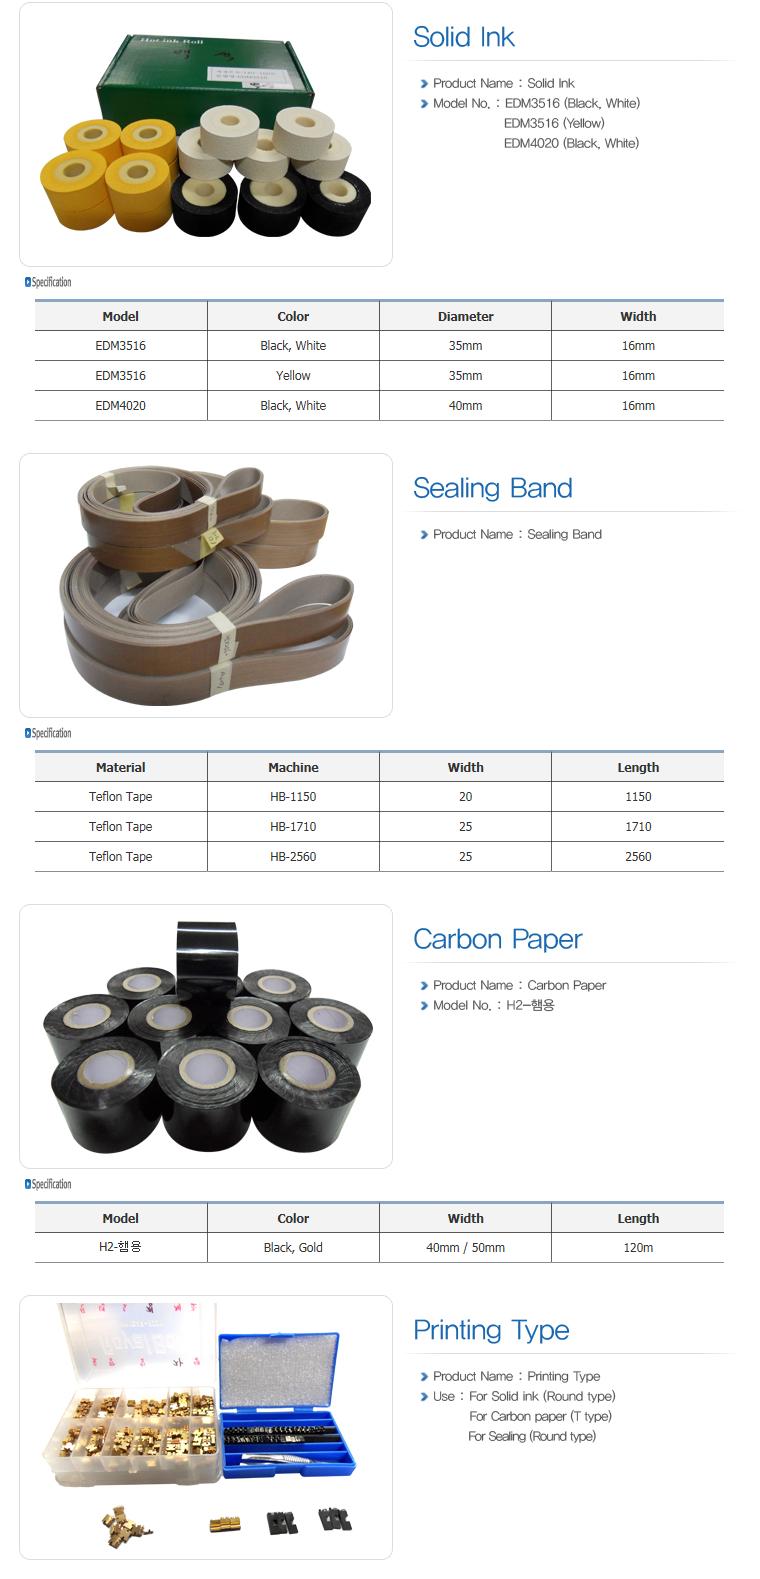 HANSAEM TECH Consumables (Solid Ink, Sealing Band, Print Type)